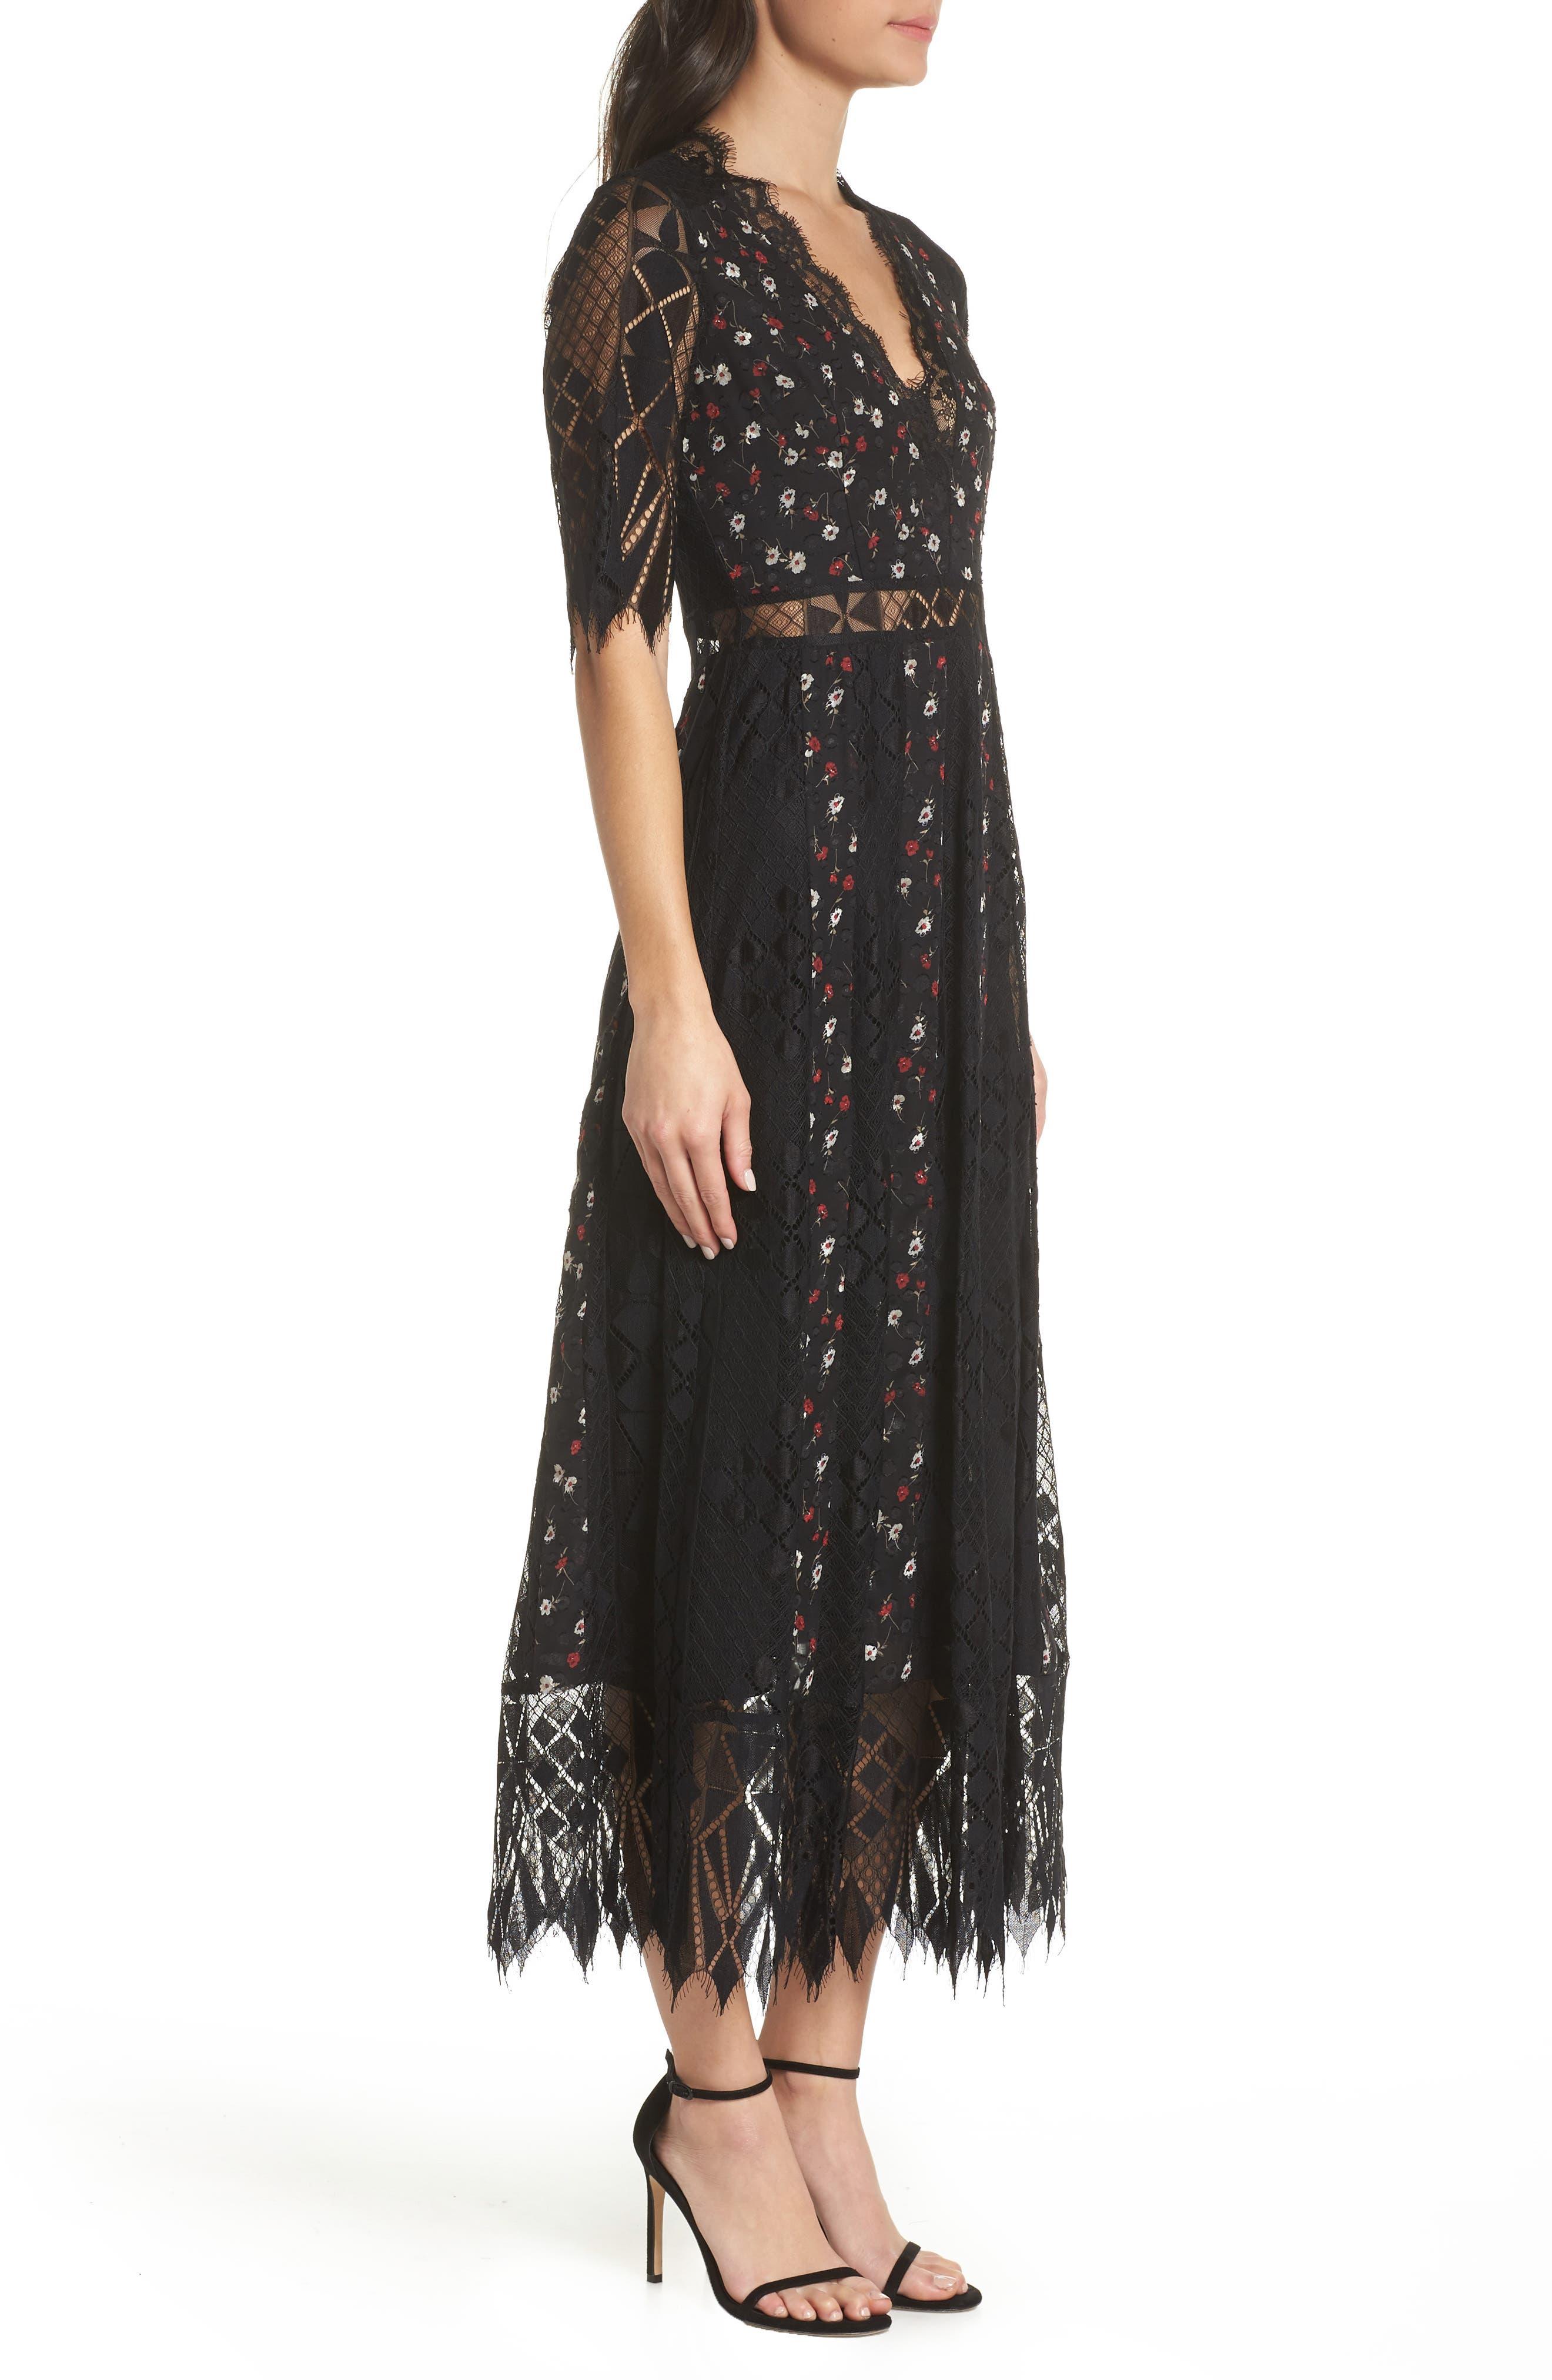 FOXIEDOX, Josefine Lace & Clip Dot Tea Length Dress, Alternate thumbnail 4, color, 001